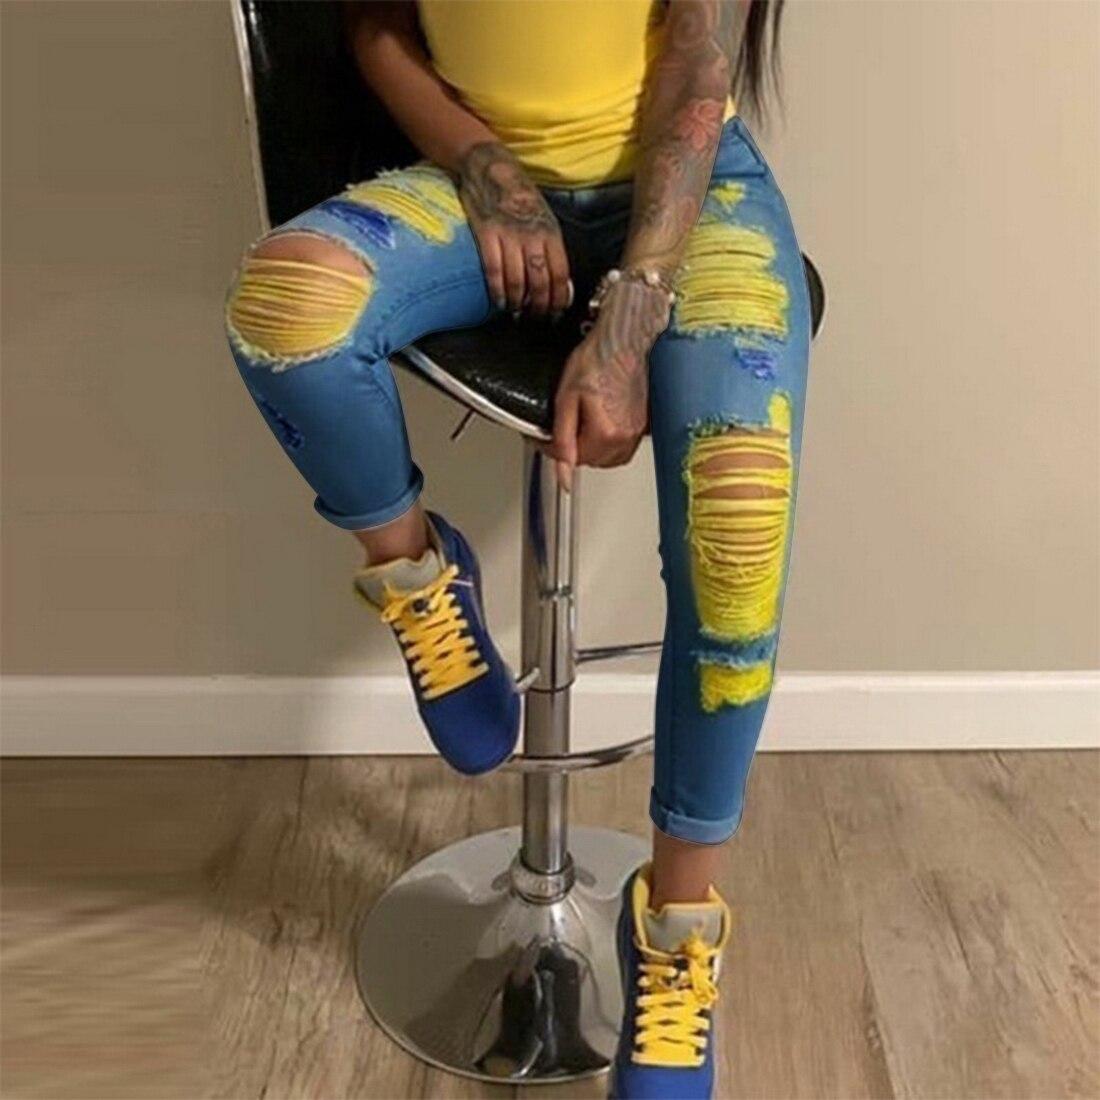 CYSINCOS Women High Waist Straight Jeans Pant Holes Streetwear Fashion Female Denim Jeans Woman Ripped Casual Jeans Ladies 2020